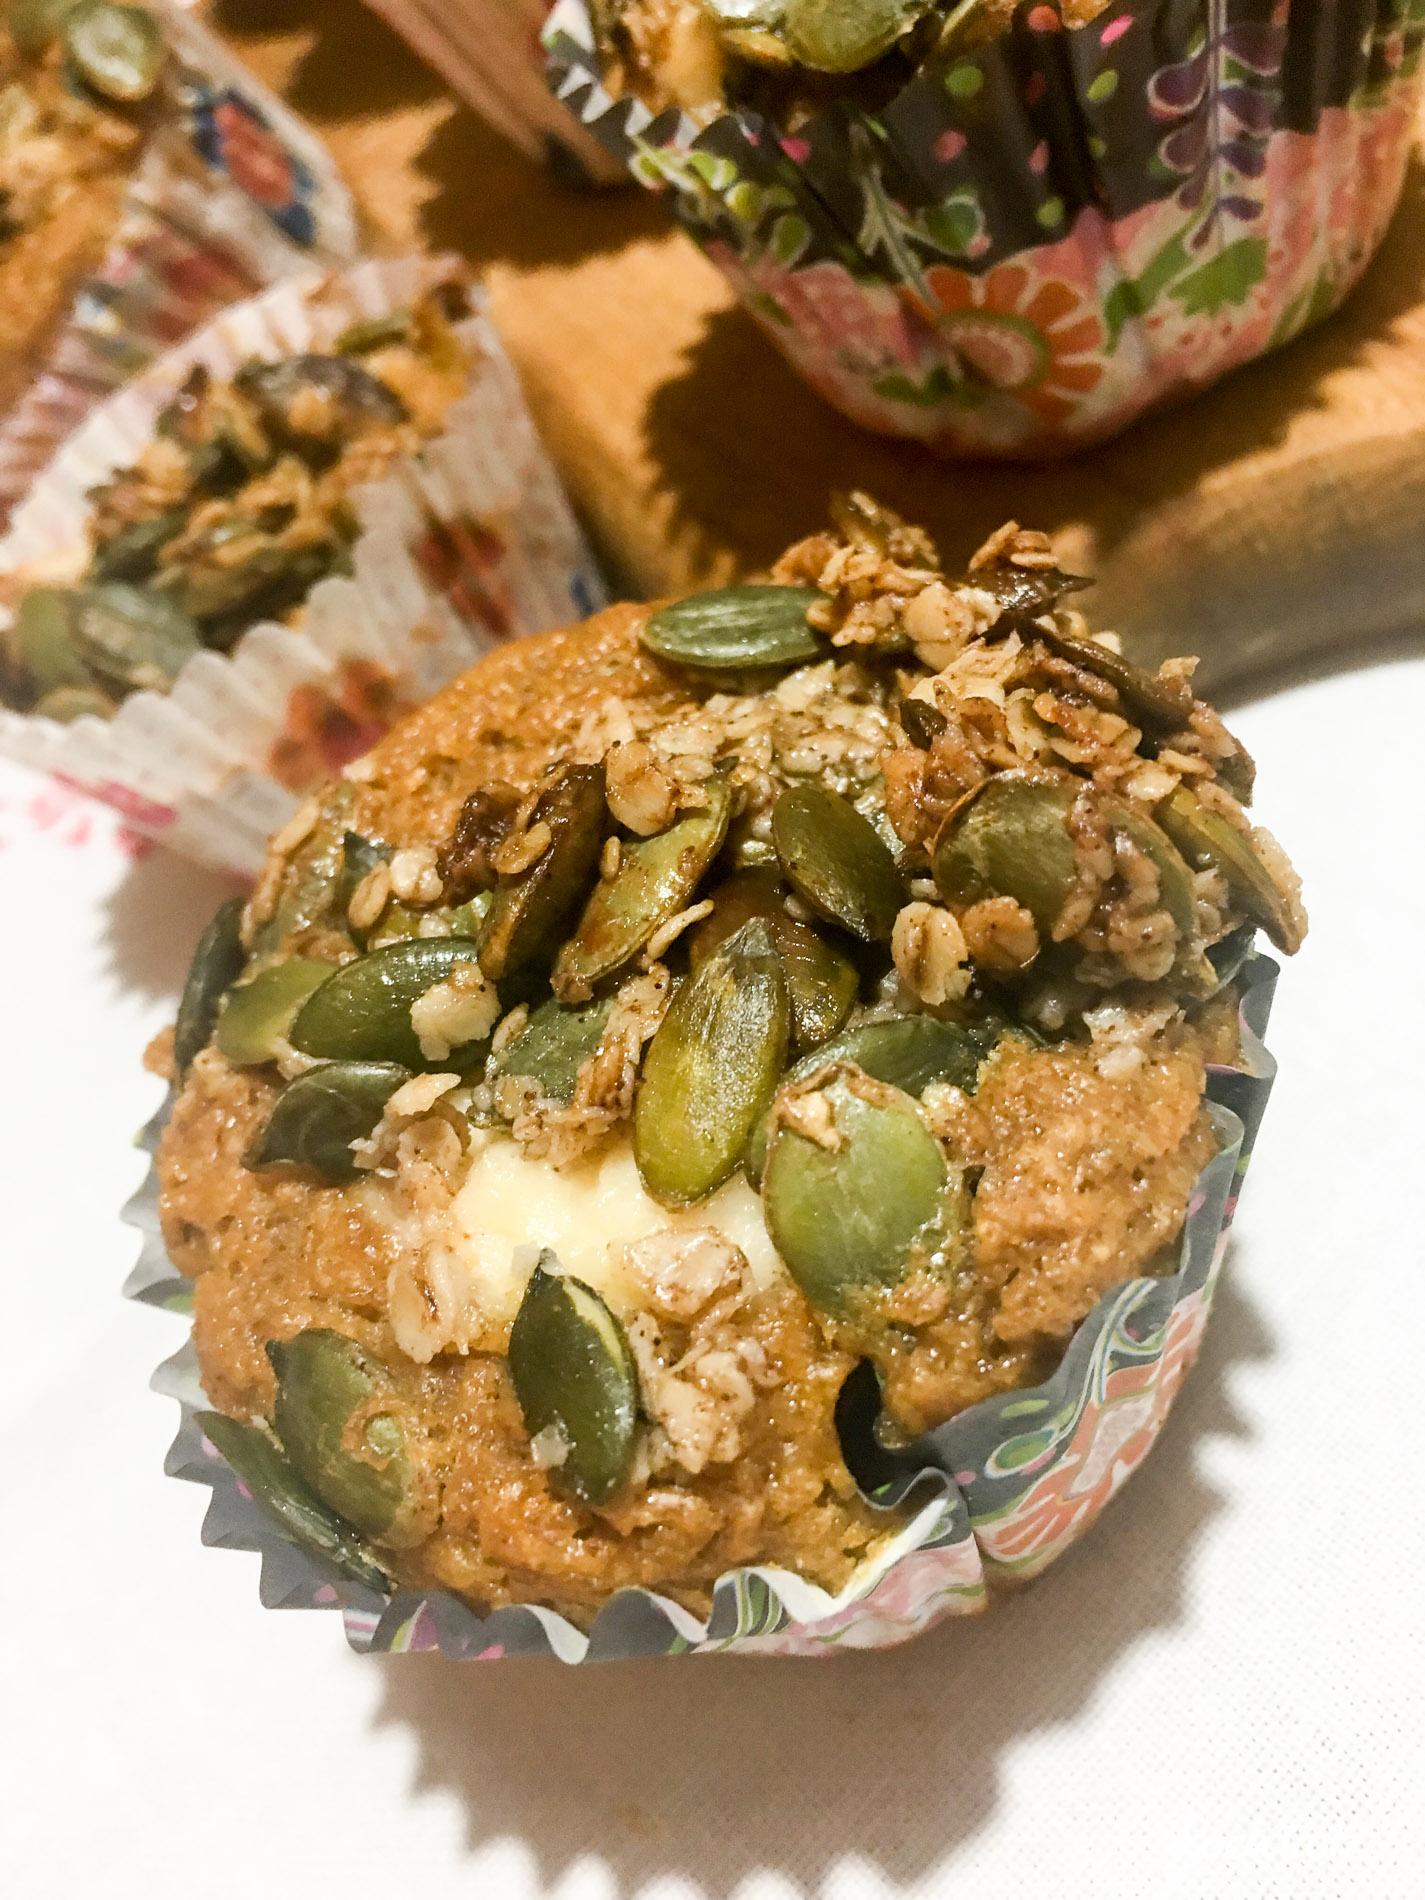 kuerbismuffins-suess-frisckasefuellung-kuerbiskern-topping-auch-glutenfrei-8